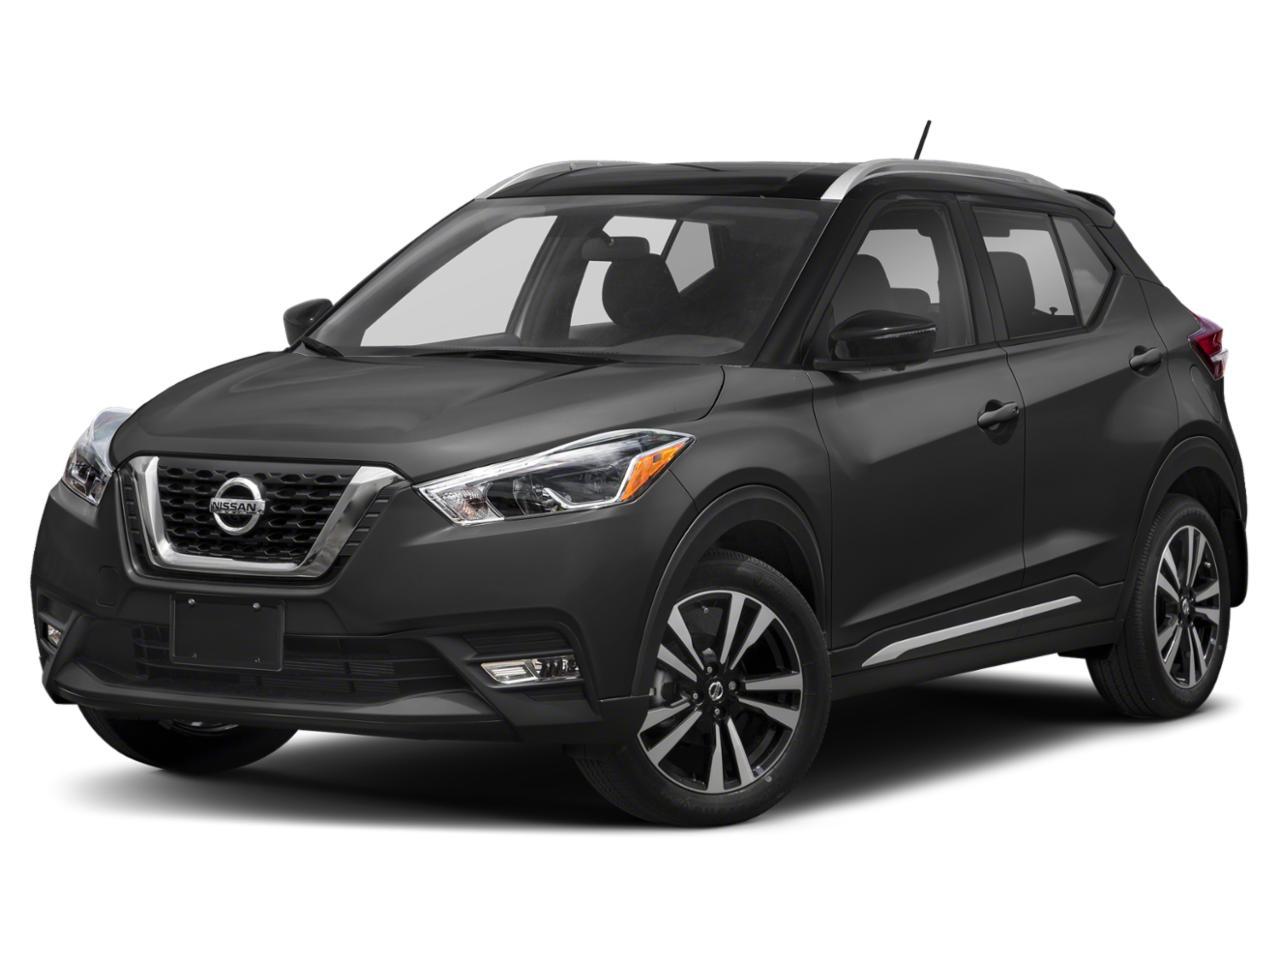 2018 Nissan Kicks Vehicle Photo in Appleton, WI 54913